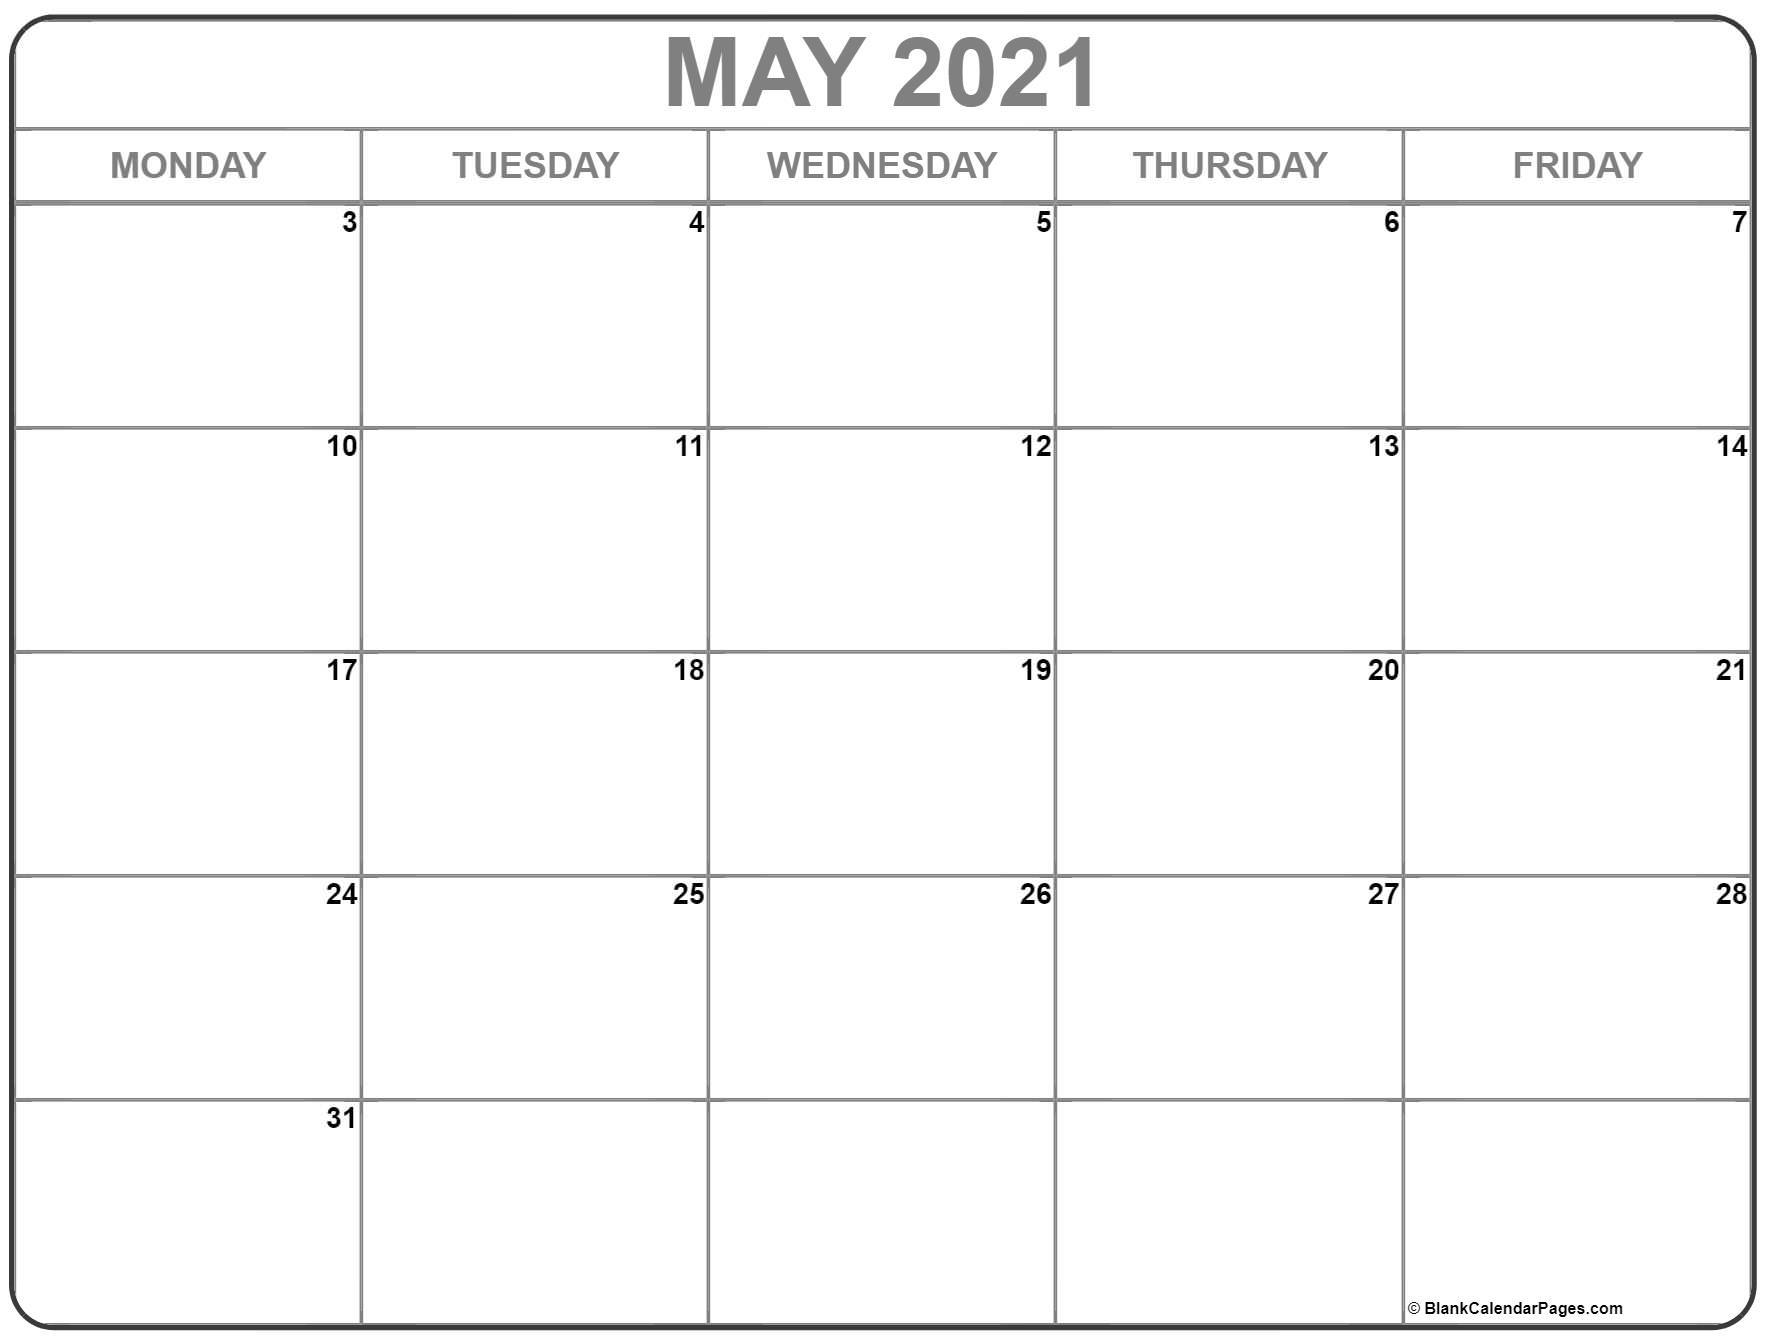 May 2021 Monday Calendar | Monday To Sunday